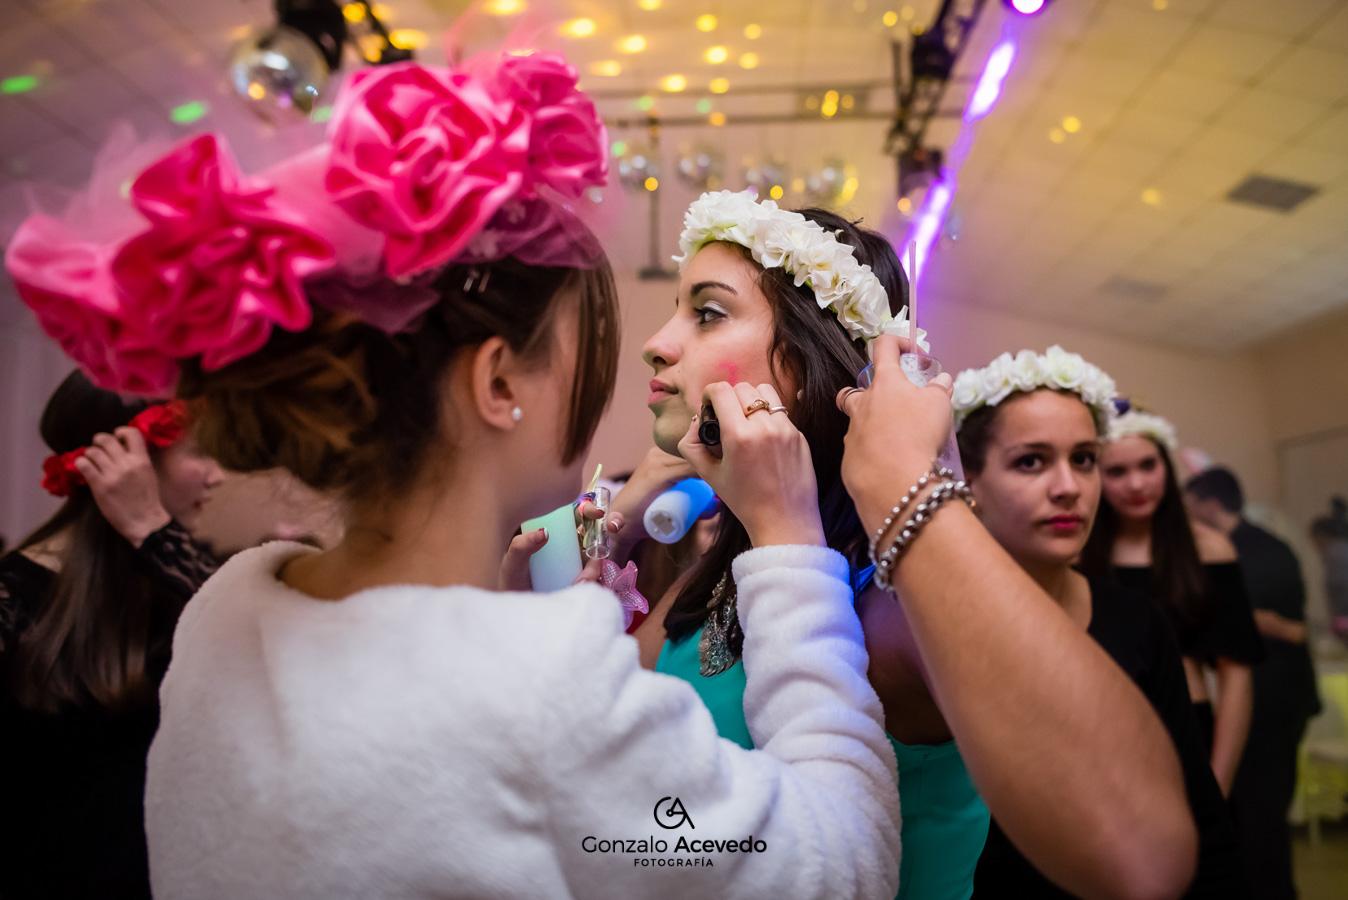 56-maru-fiesta-evento-cumpleanos-15-an-lorena-nobile-nancy-cergneux-entre-rios-salones-gonzalo-acevedo-fotografia